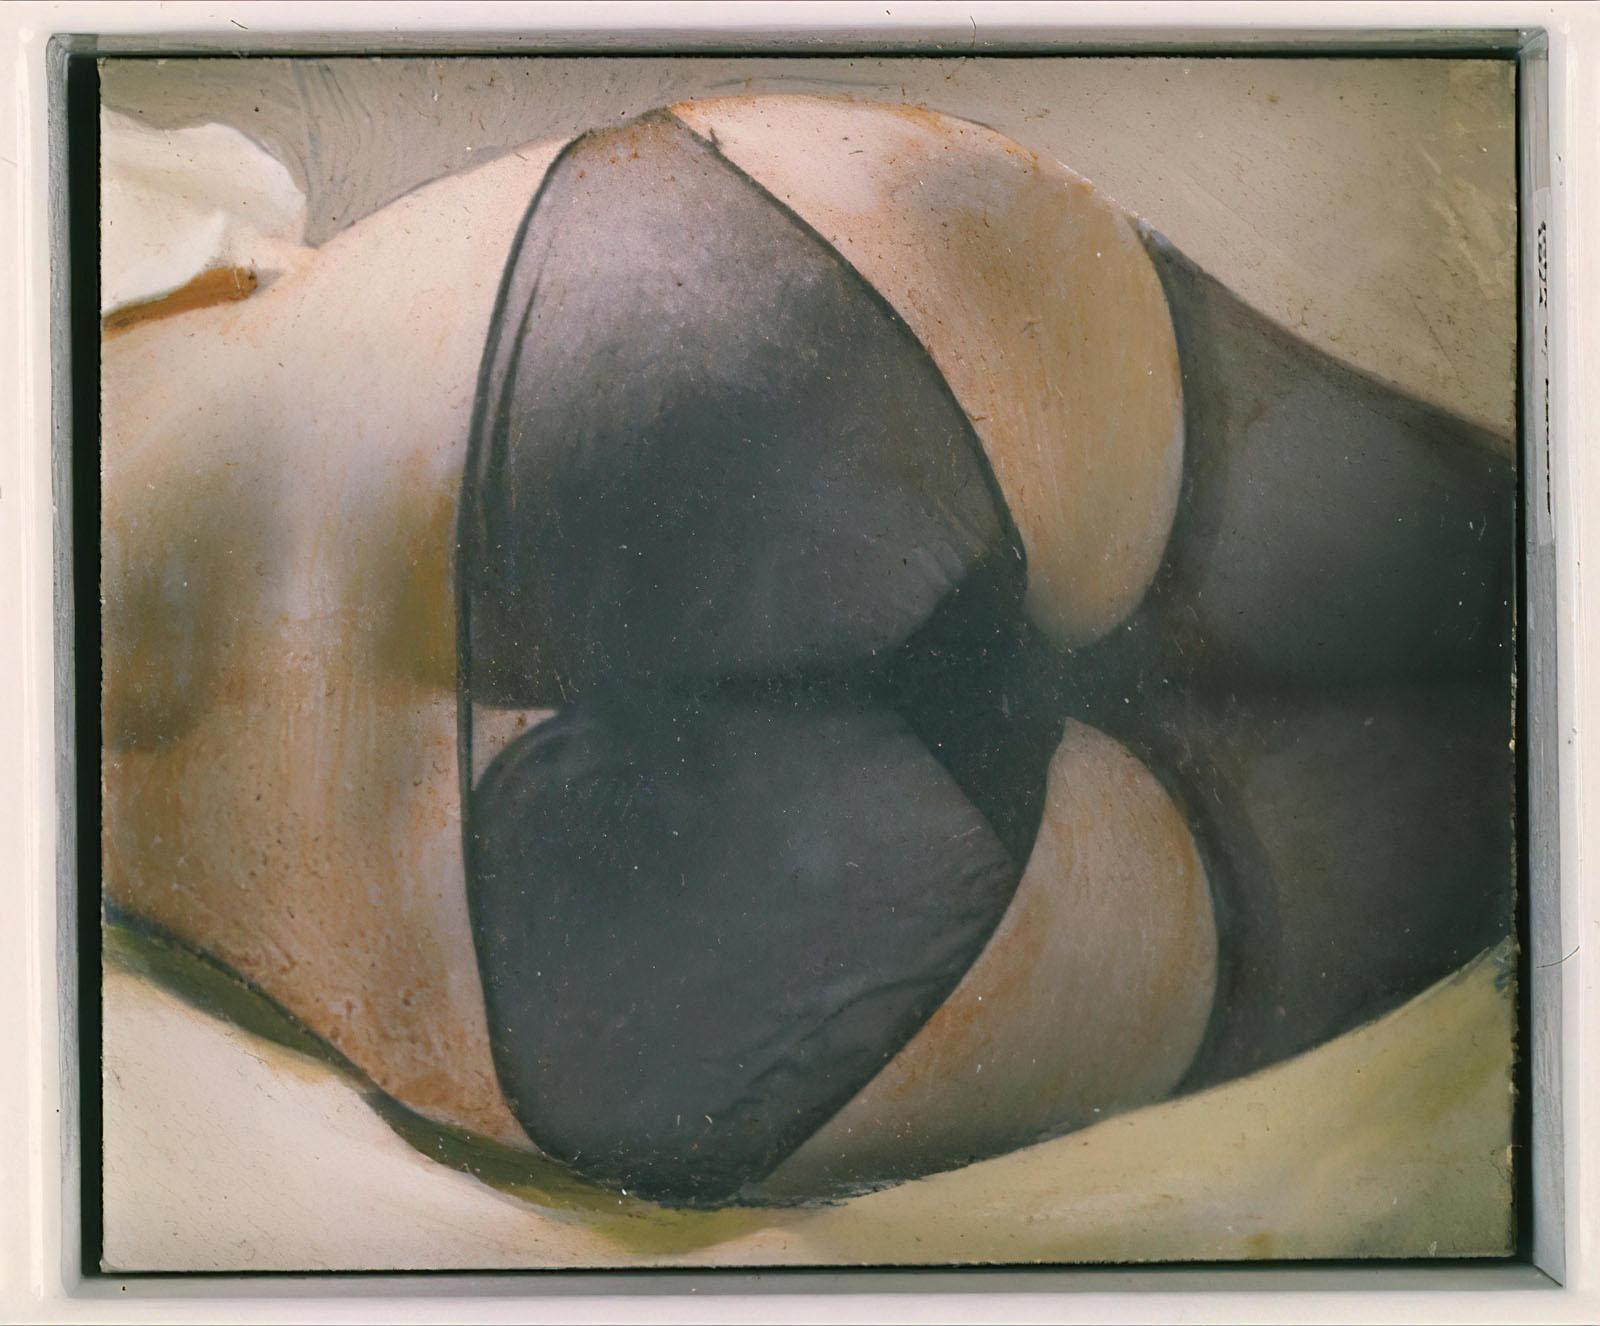 John Kacere - Untitled